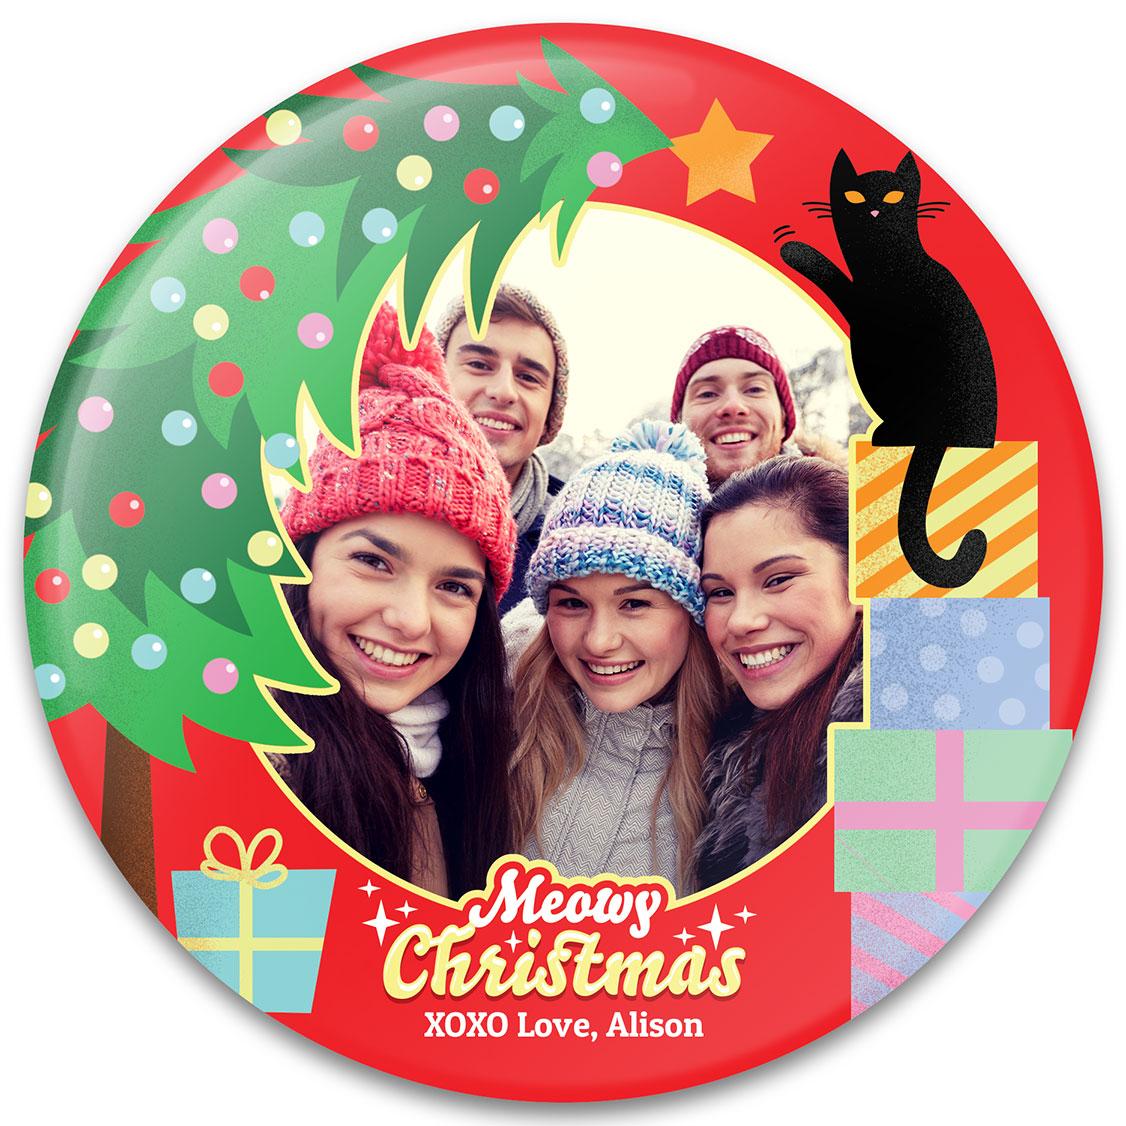 Meowy Christmas Photo Gift